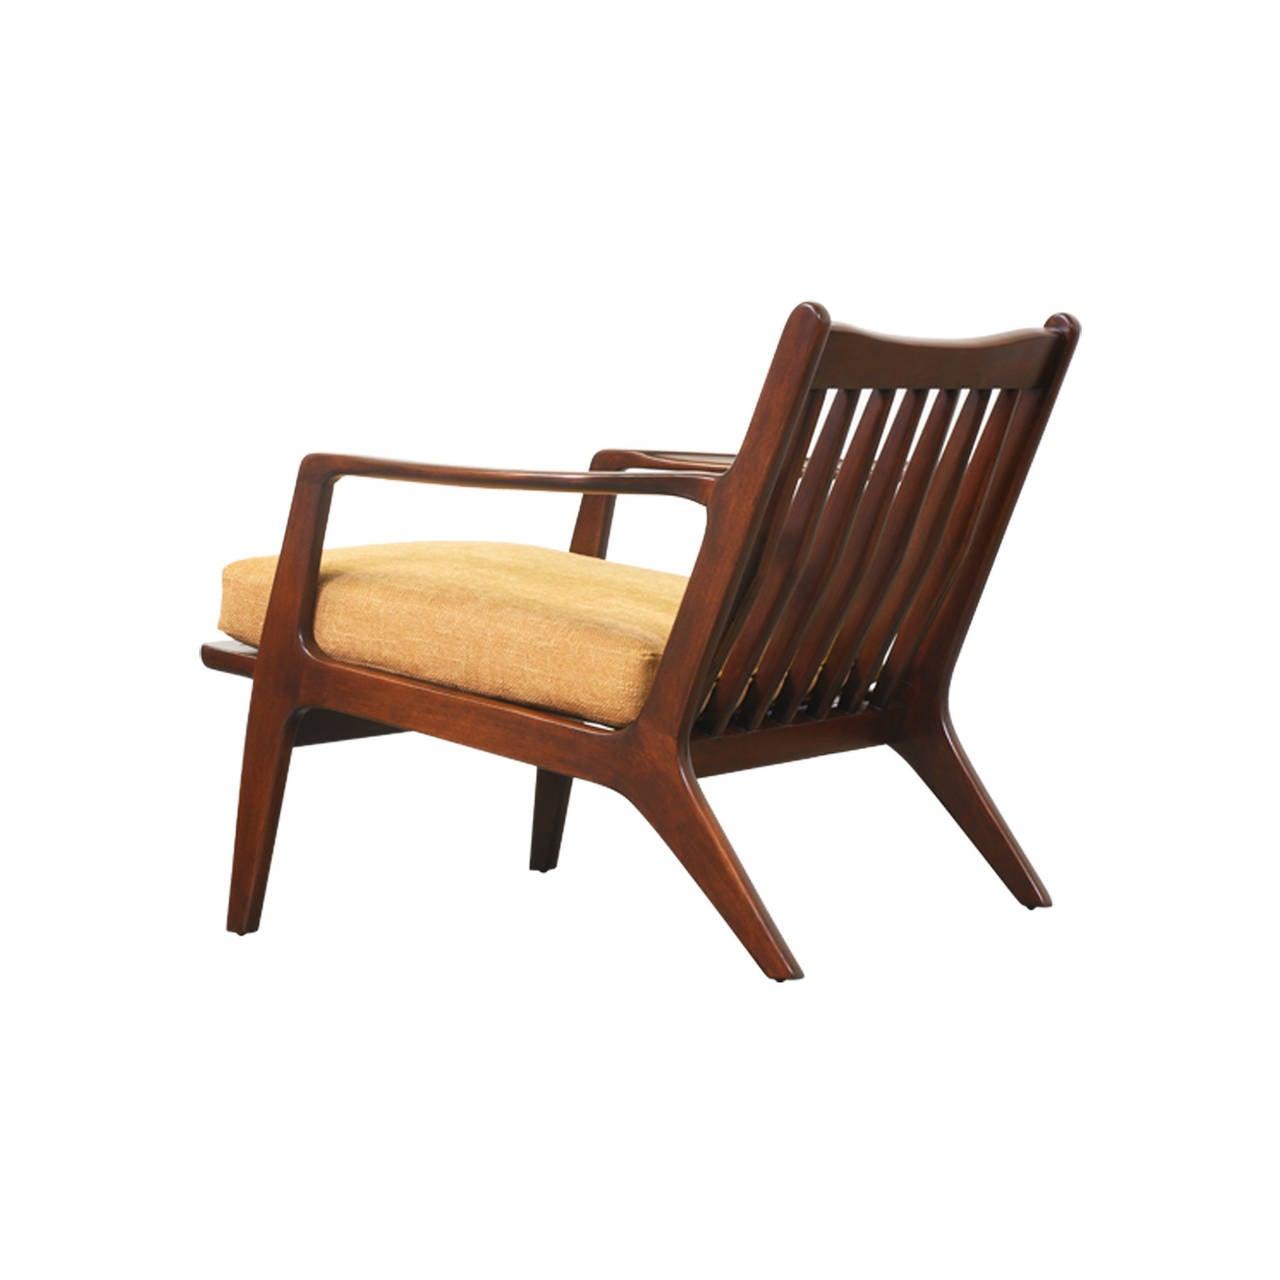 Kofod Larsen Lounge Chairs for Selig at 1stdibs